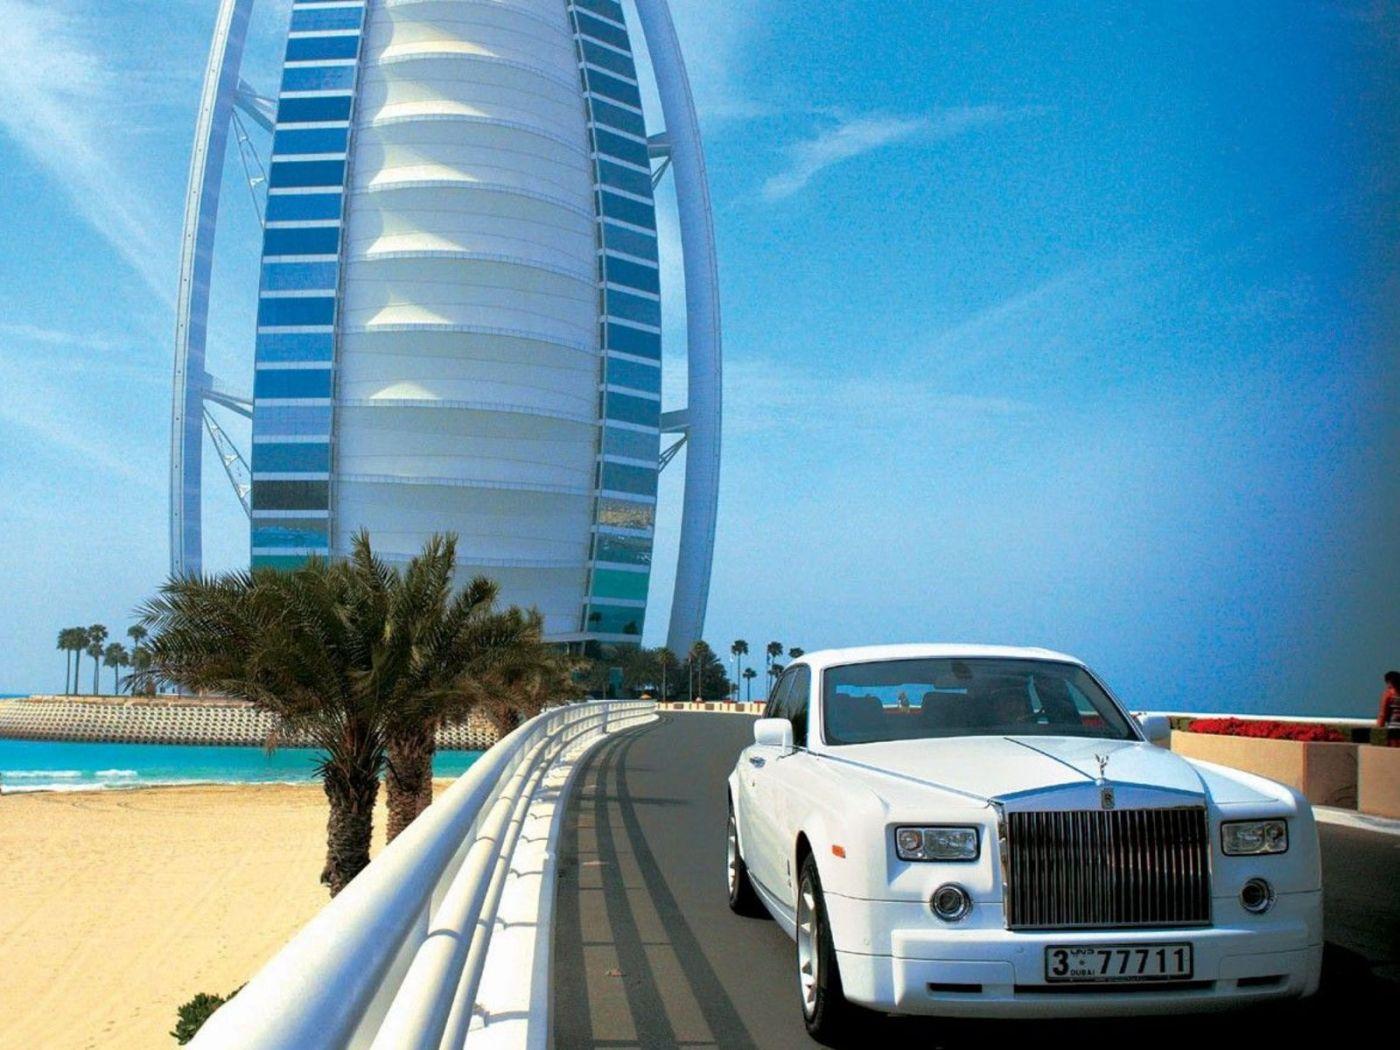 Dubai Arhitectur Wallpaper 1400x1050